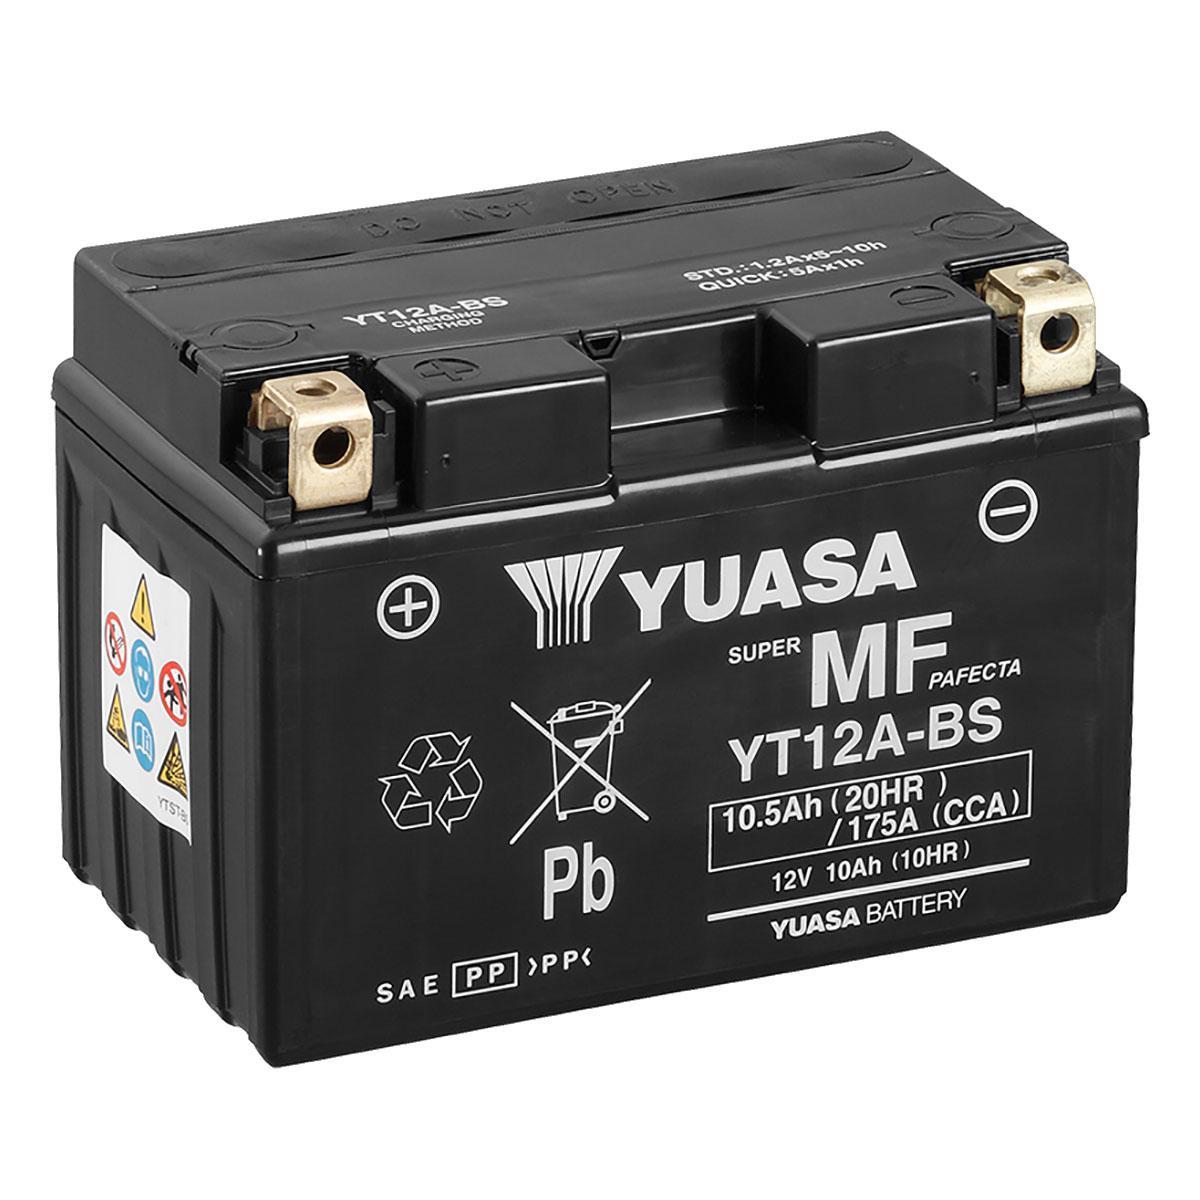 Yuasa Yt12a Bs 12v Vrla Motorbike Motorcycle Battery